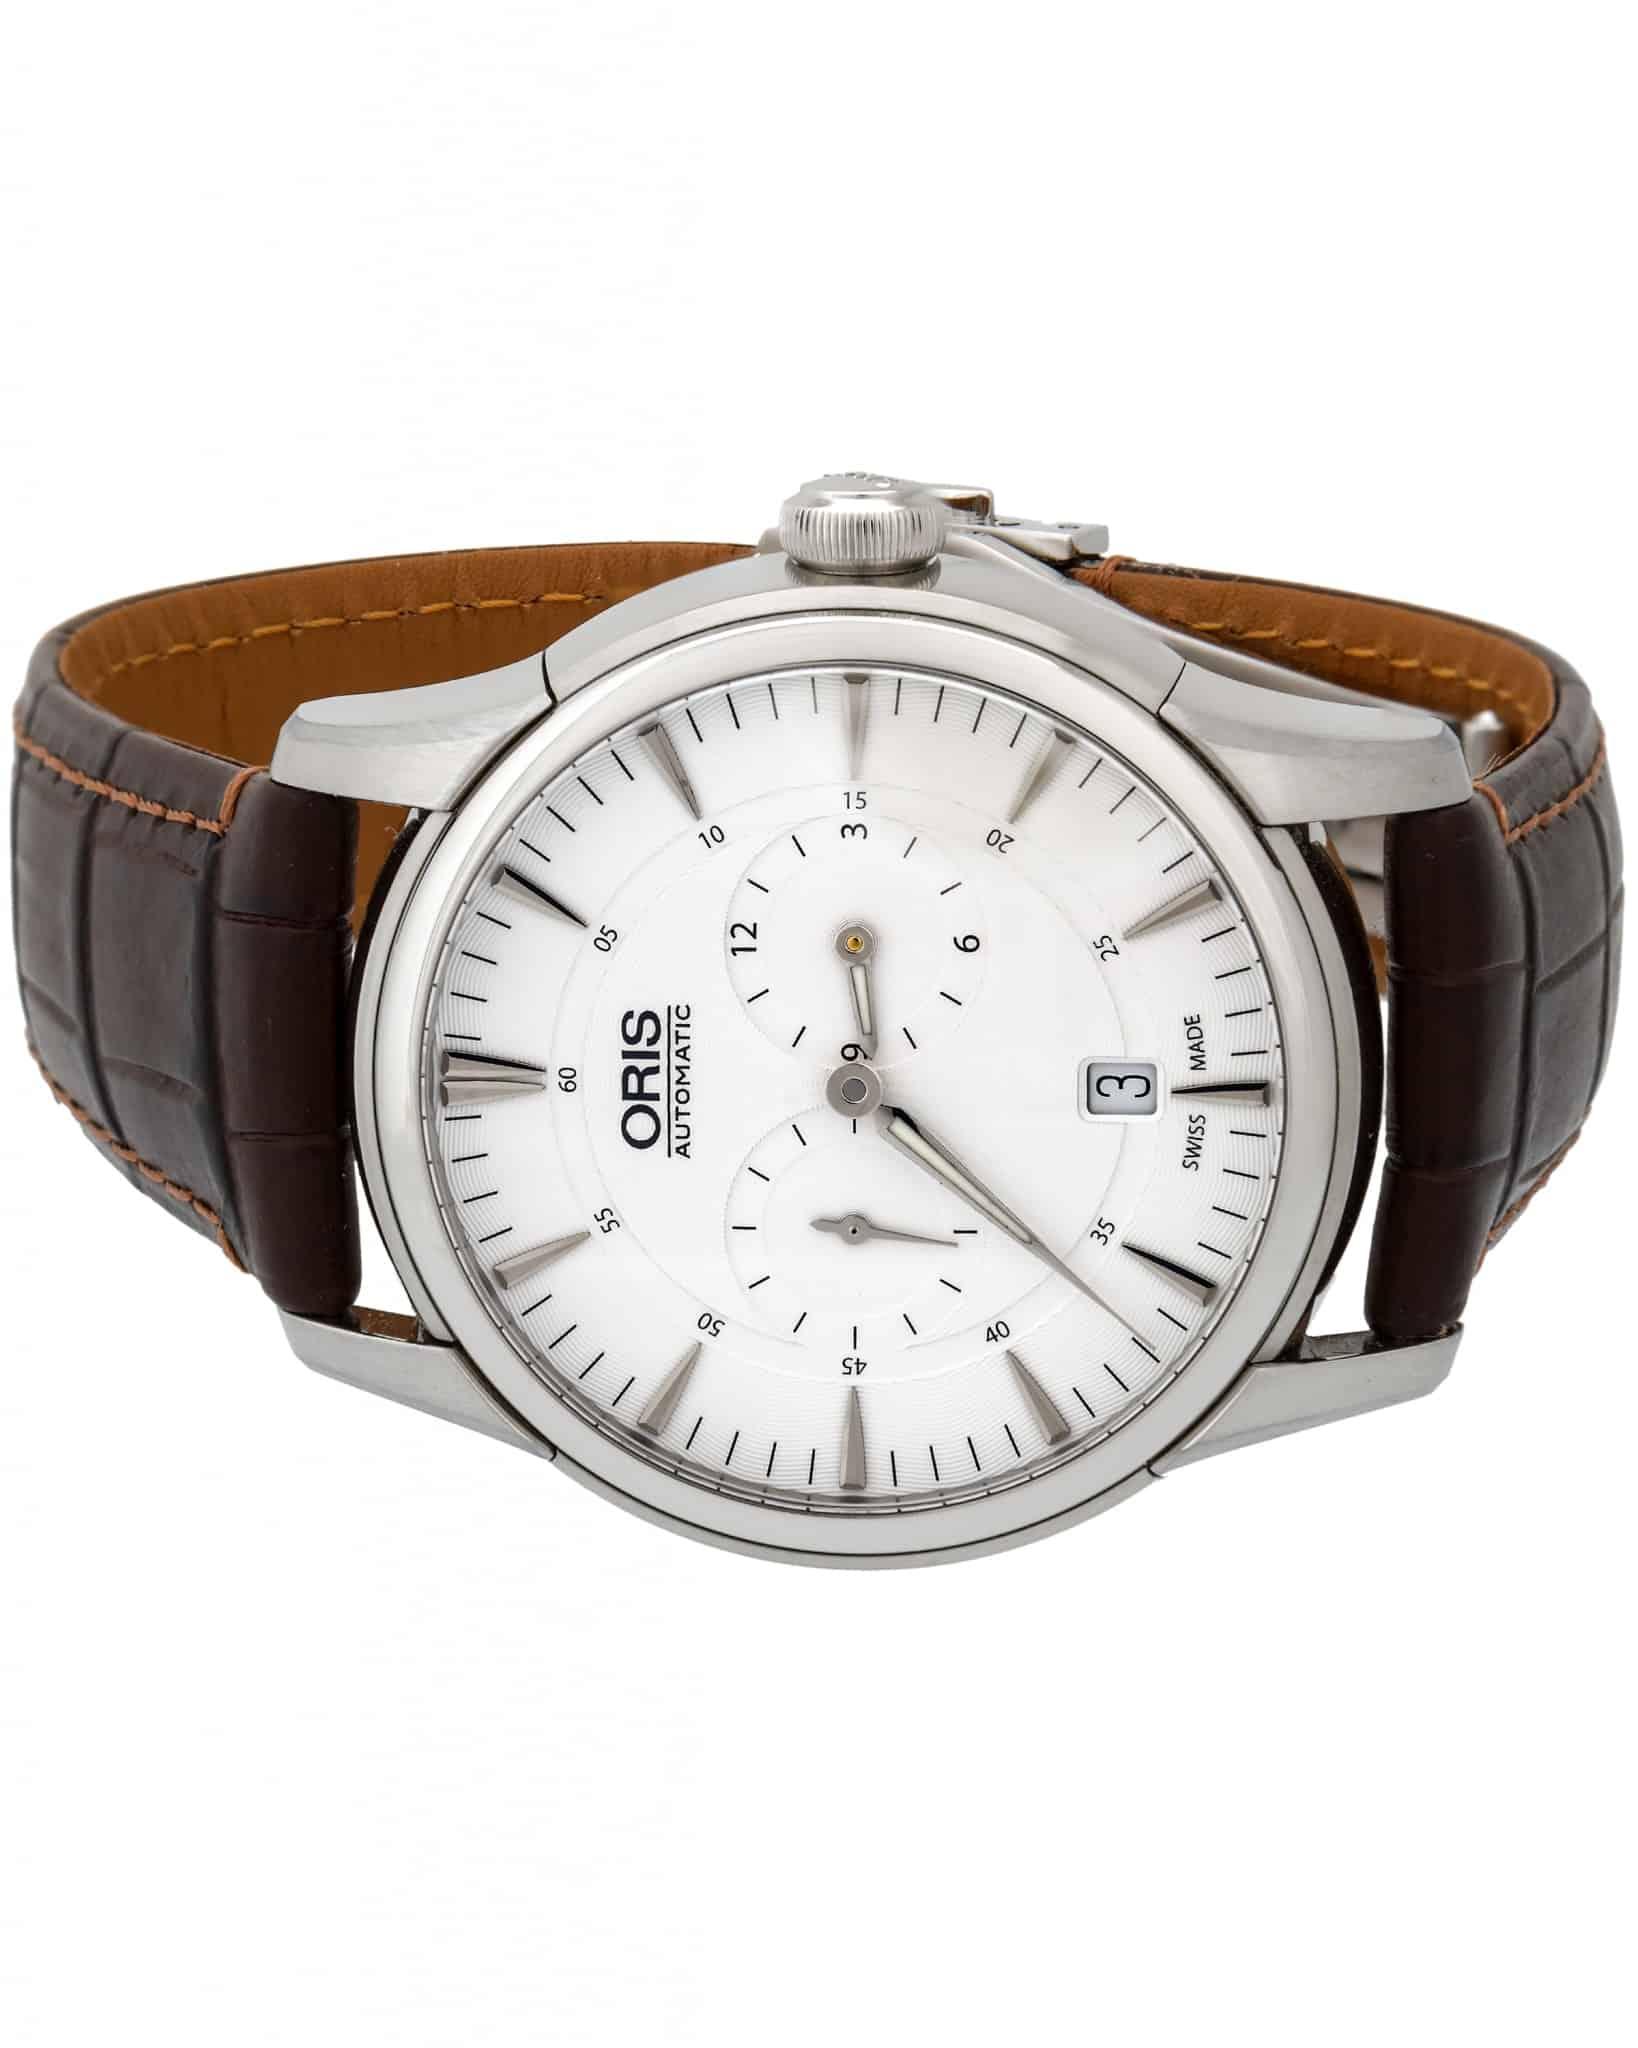 Oris Artelier Regulateur Automatic Men's Watch